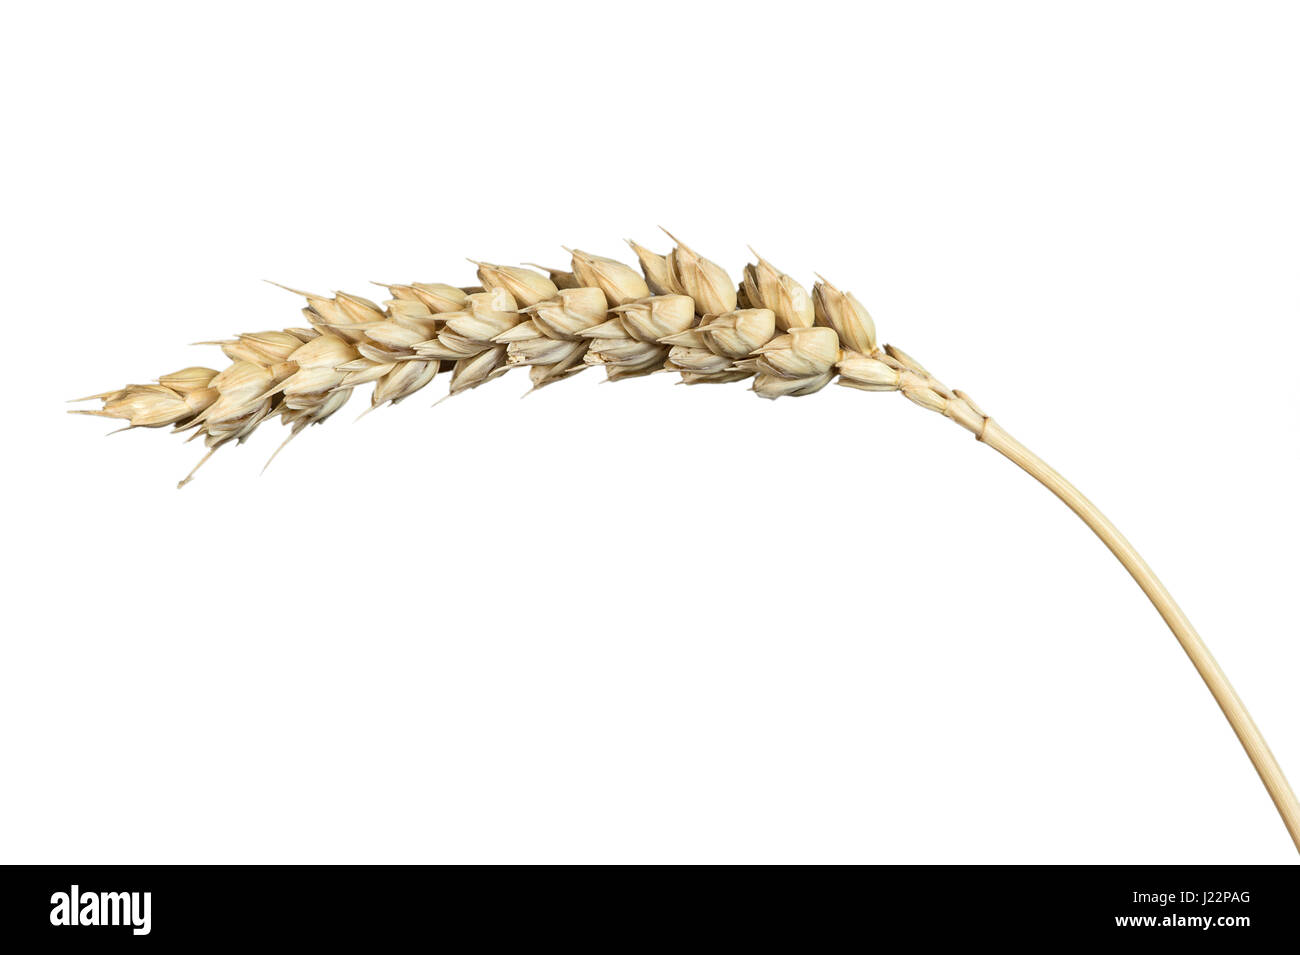 Common Wheat Triticum Aestivum Stock Photos & Common Wheat Triticum ...